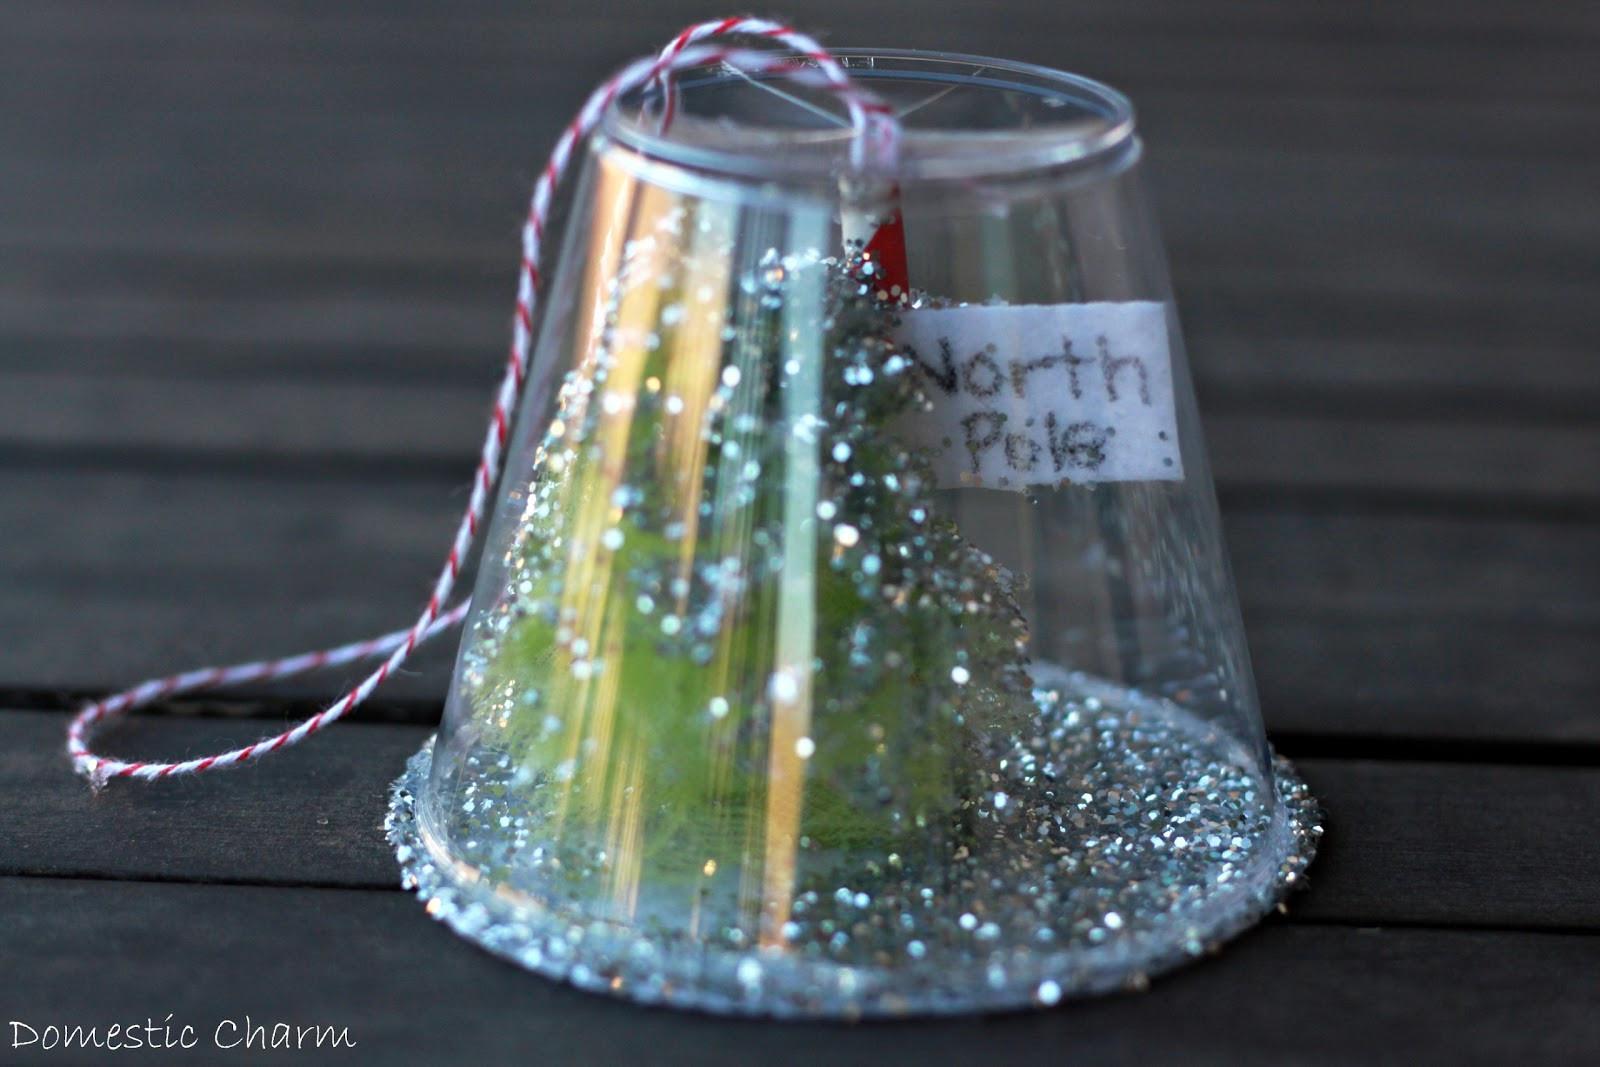 Christmas Homemade Craft  Preschool Crafts for Kids Christmas Ornament Cup Craft